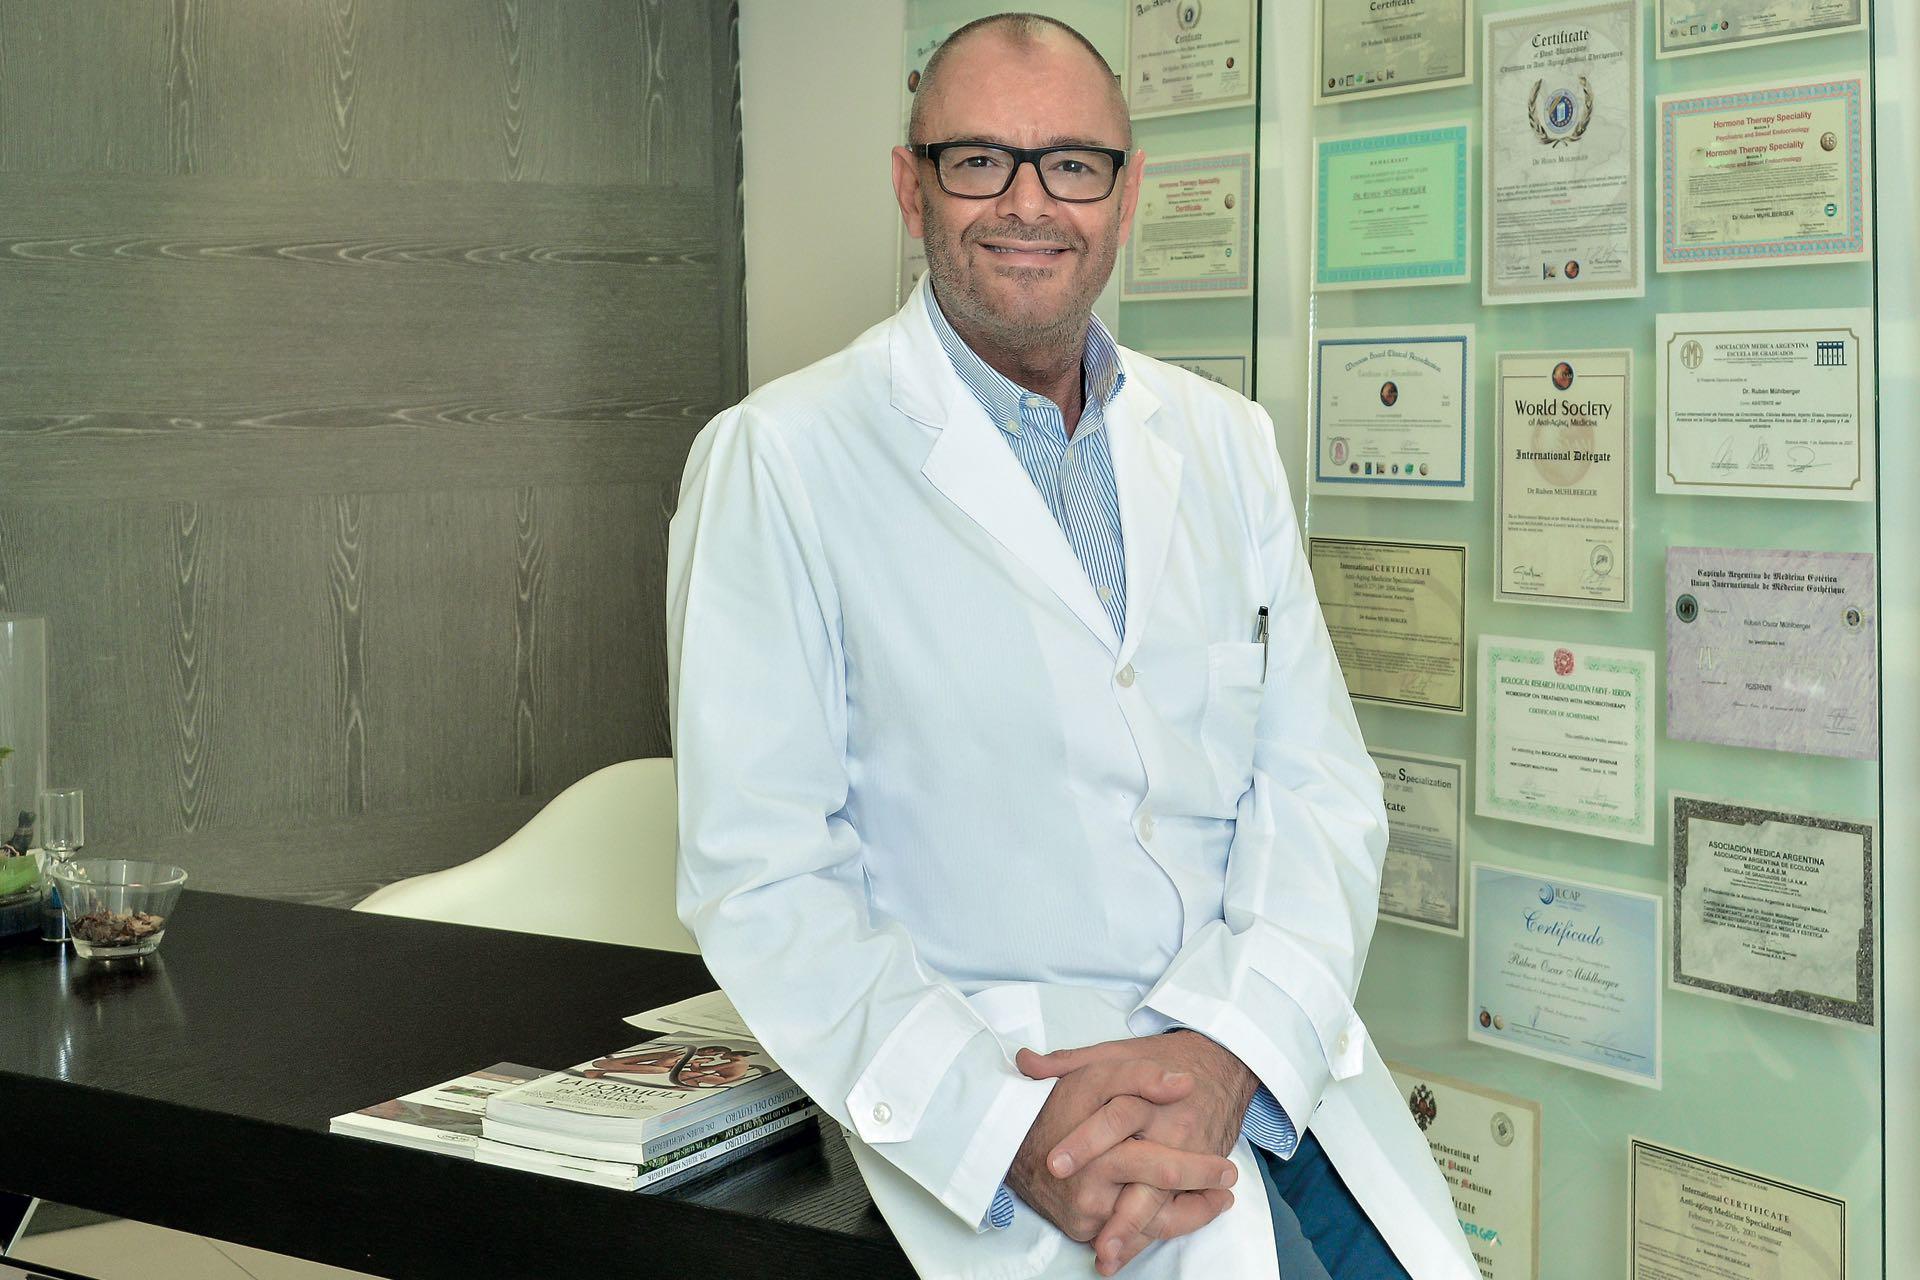 # PARA TI - DIETA METABOLICA - estar mejor - Dr. Mulhberger - 20180413